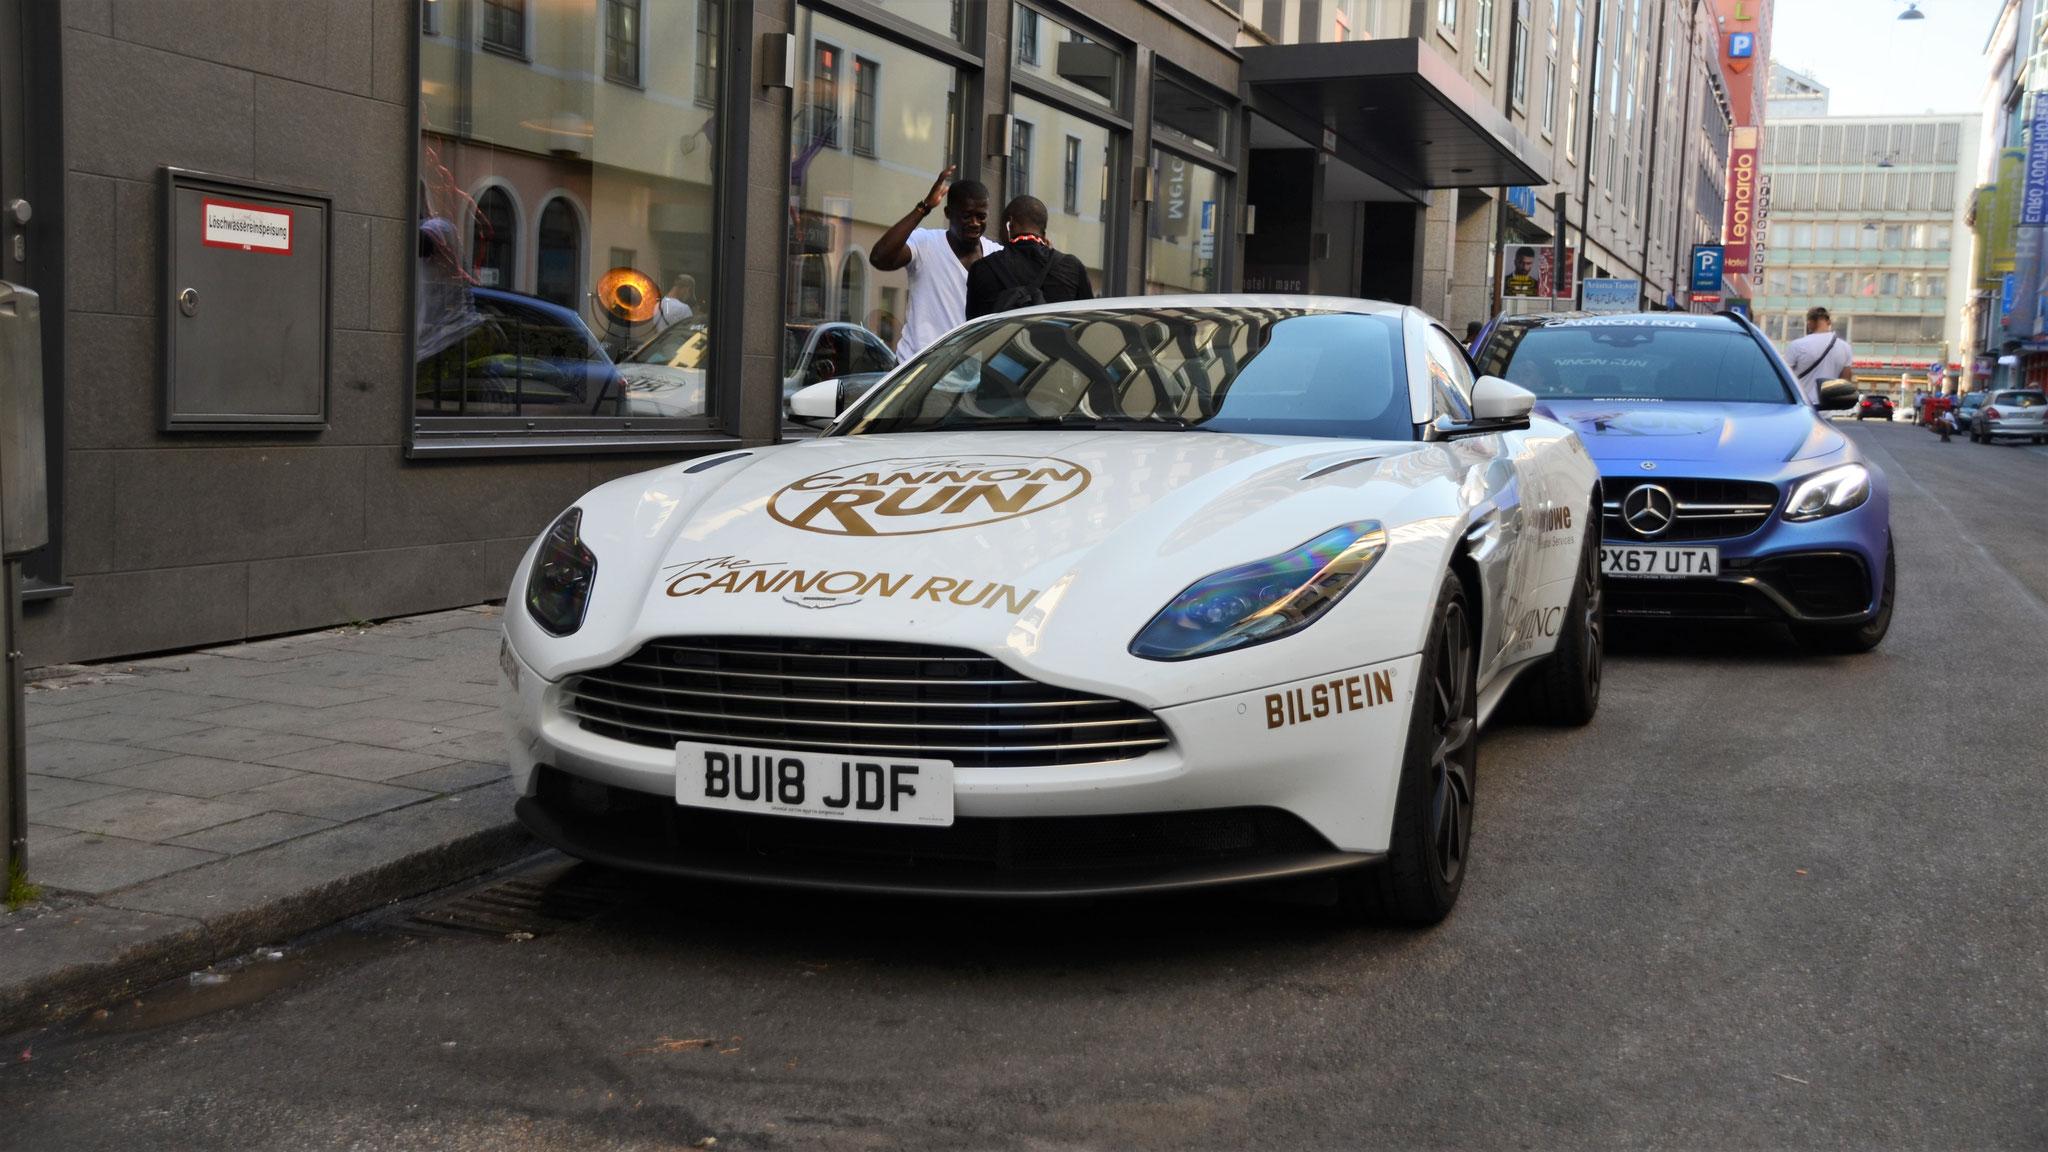 Aston Martin DB11 - BU18-JDF (GB)